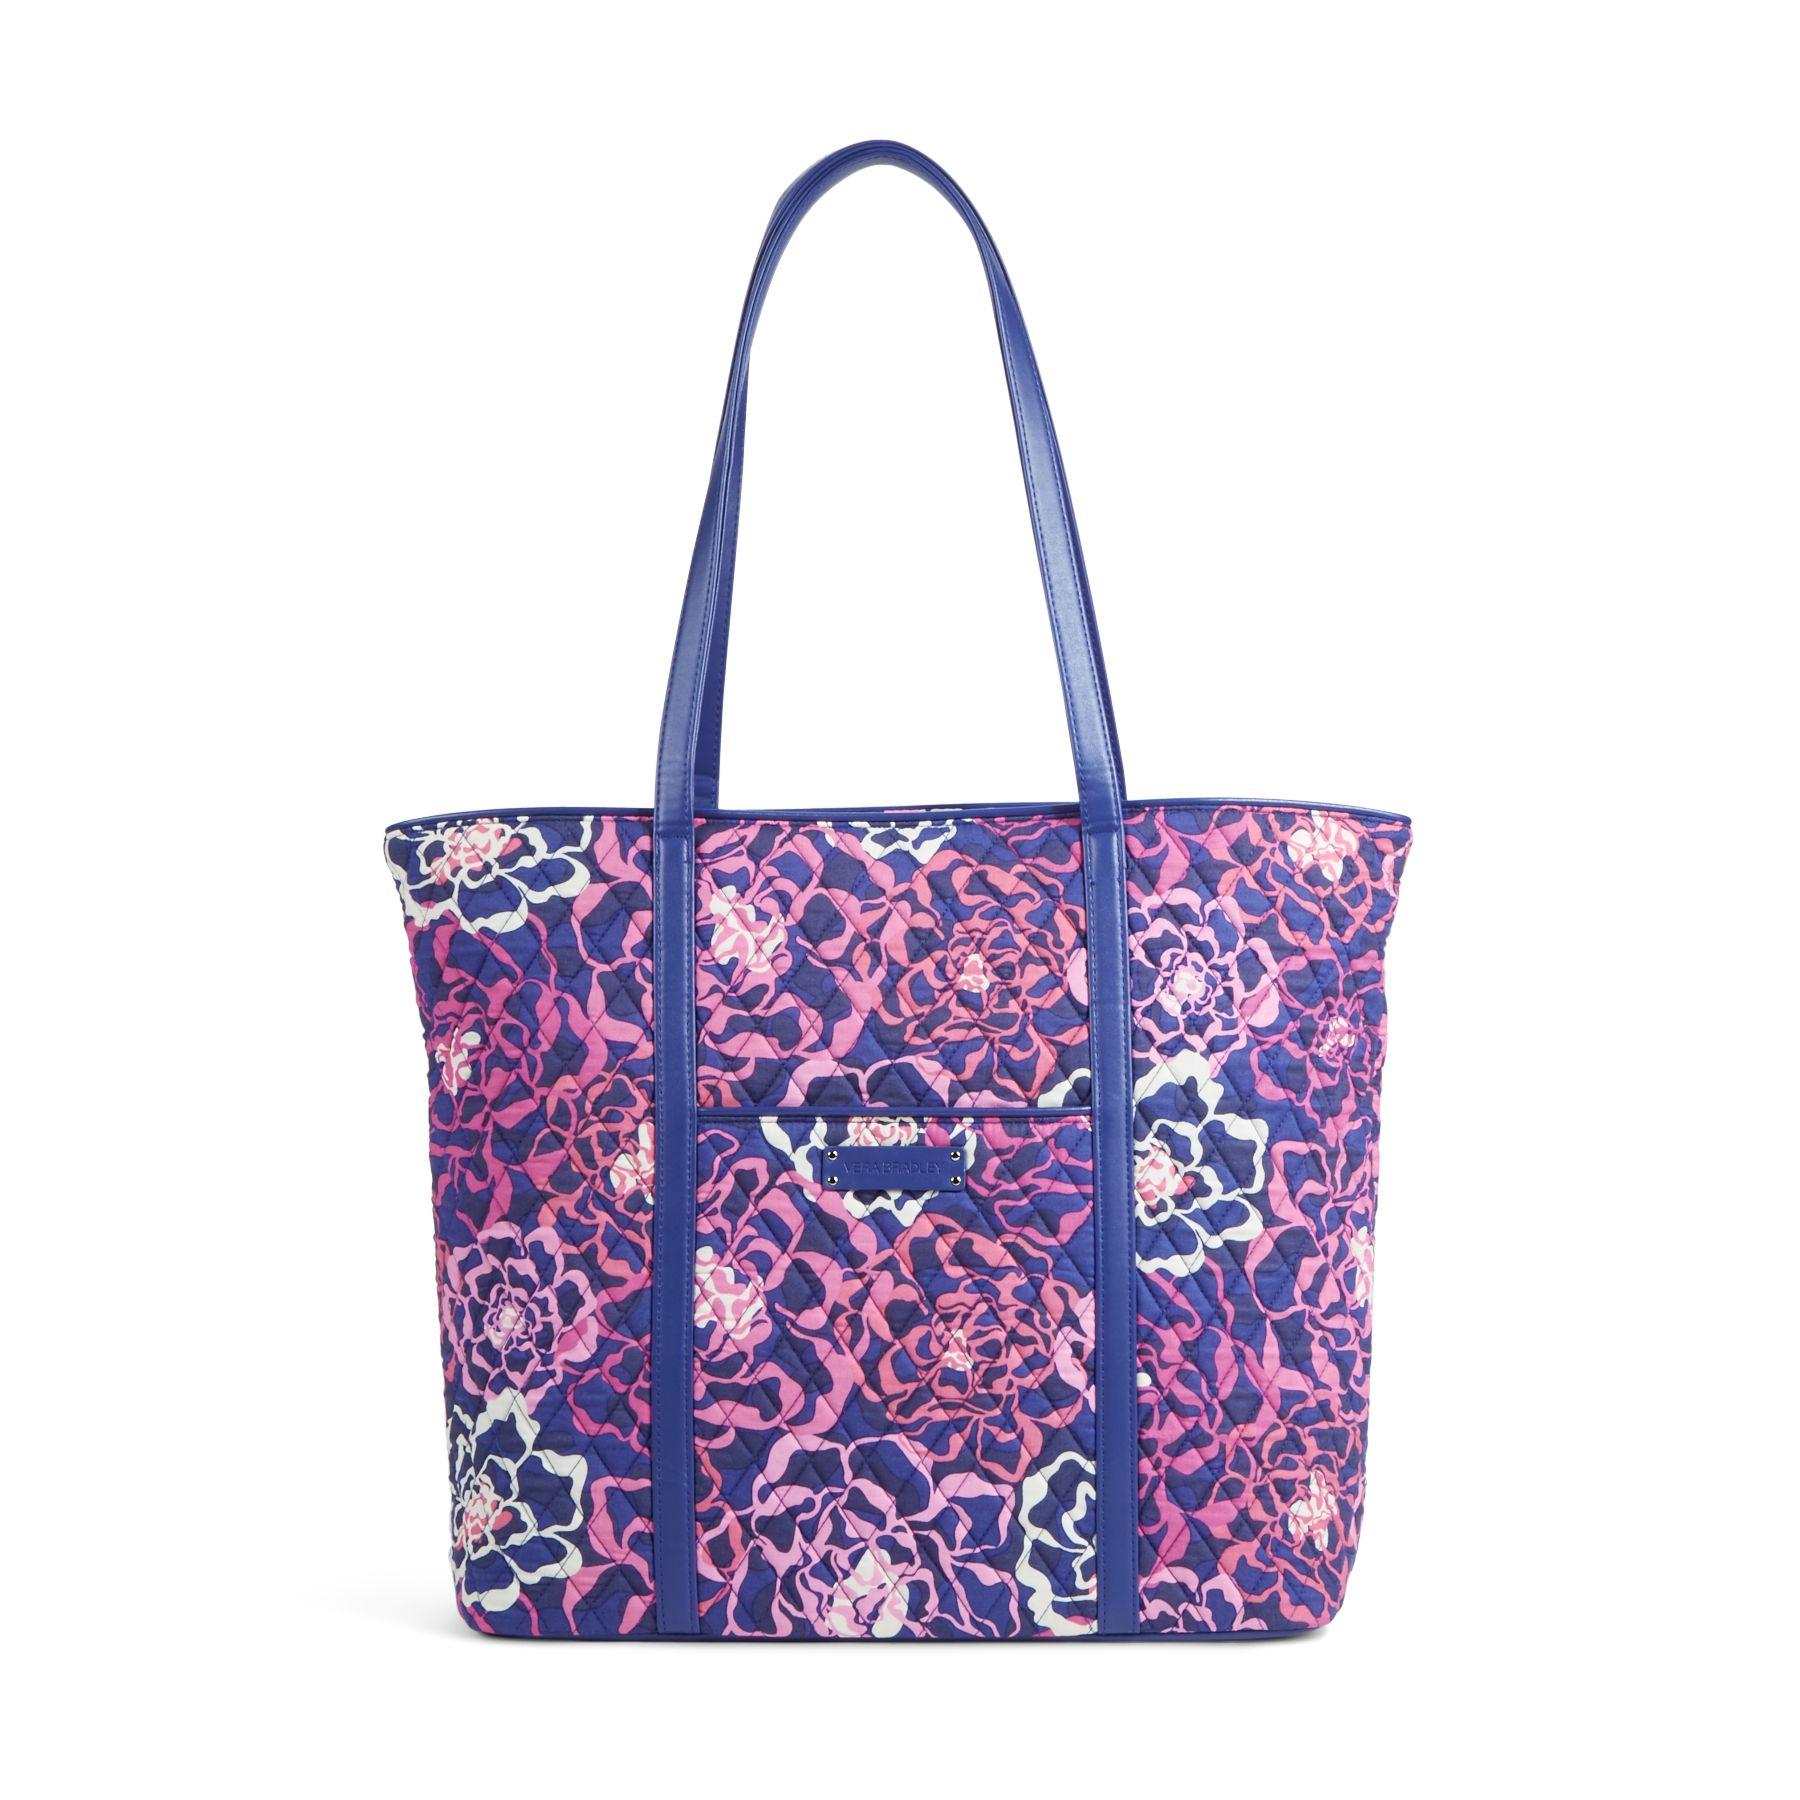 abb6002bfe Vera Bradley Trimmed Vera Tote Bag (Multiple Colors) from eBay.com ...